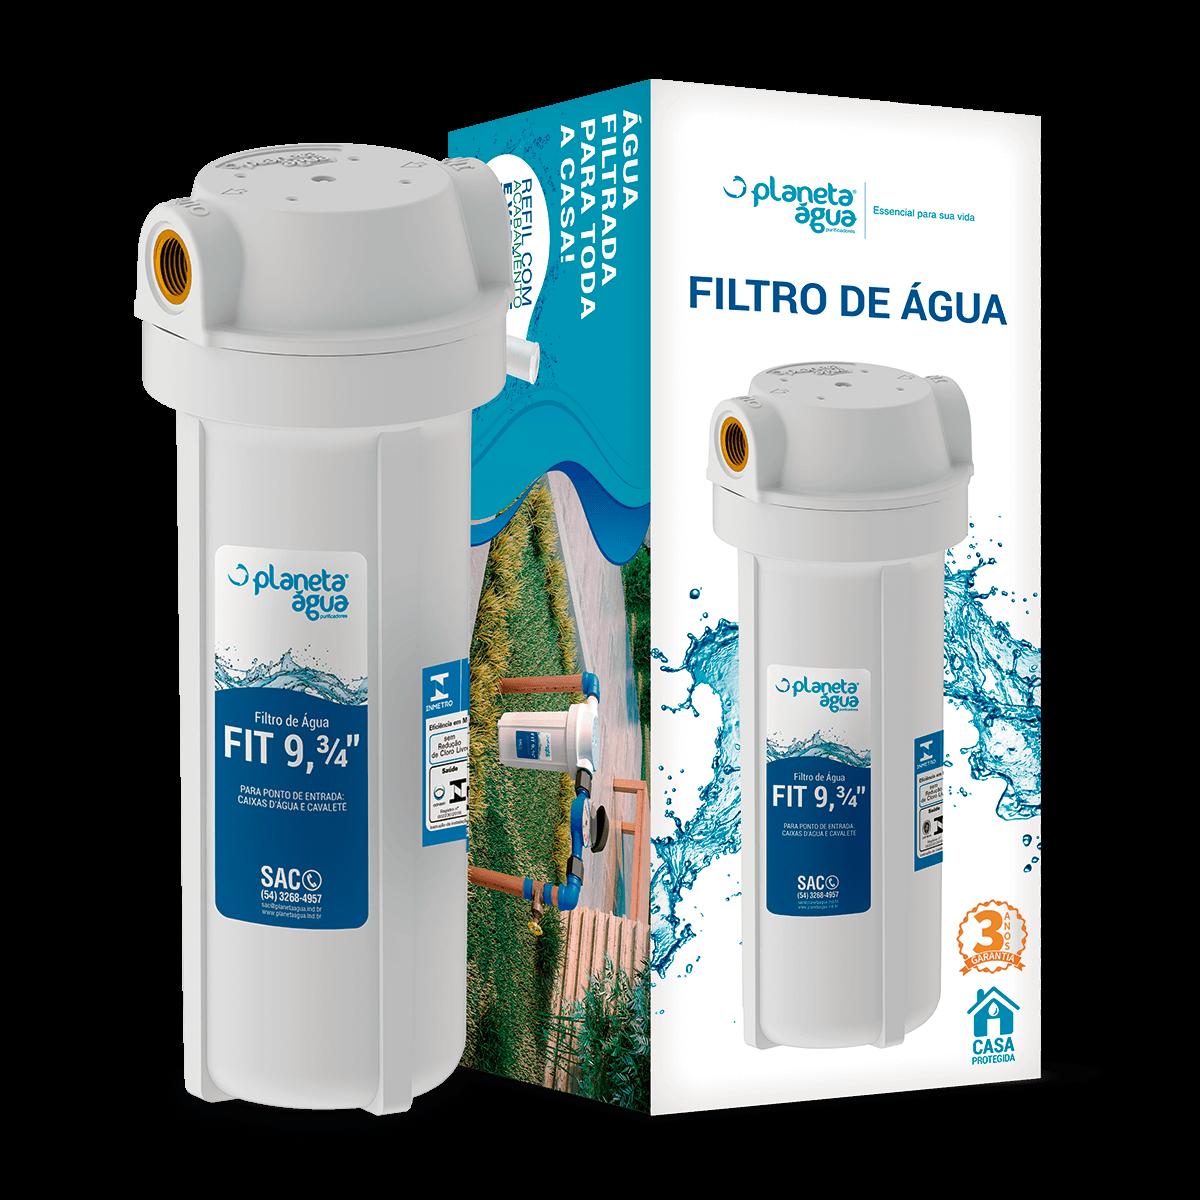 "Filtro Purificador De Água Para Caixa Dágua Cavalete 9"" 3/4   - DOTEC SHOP"